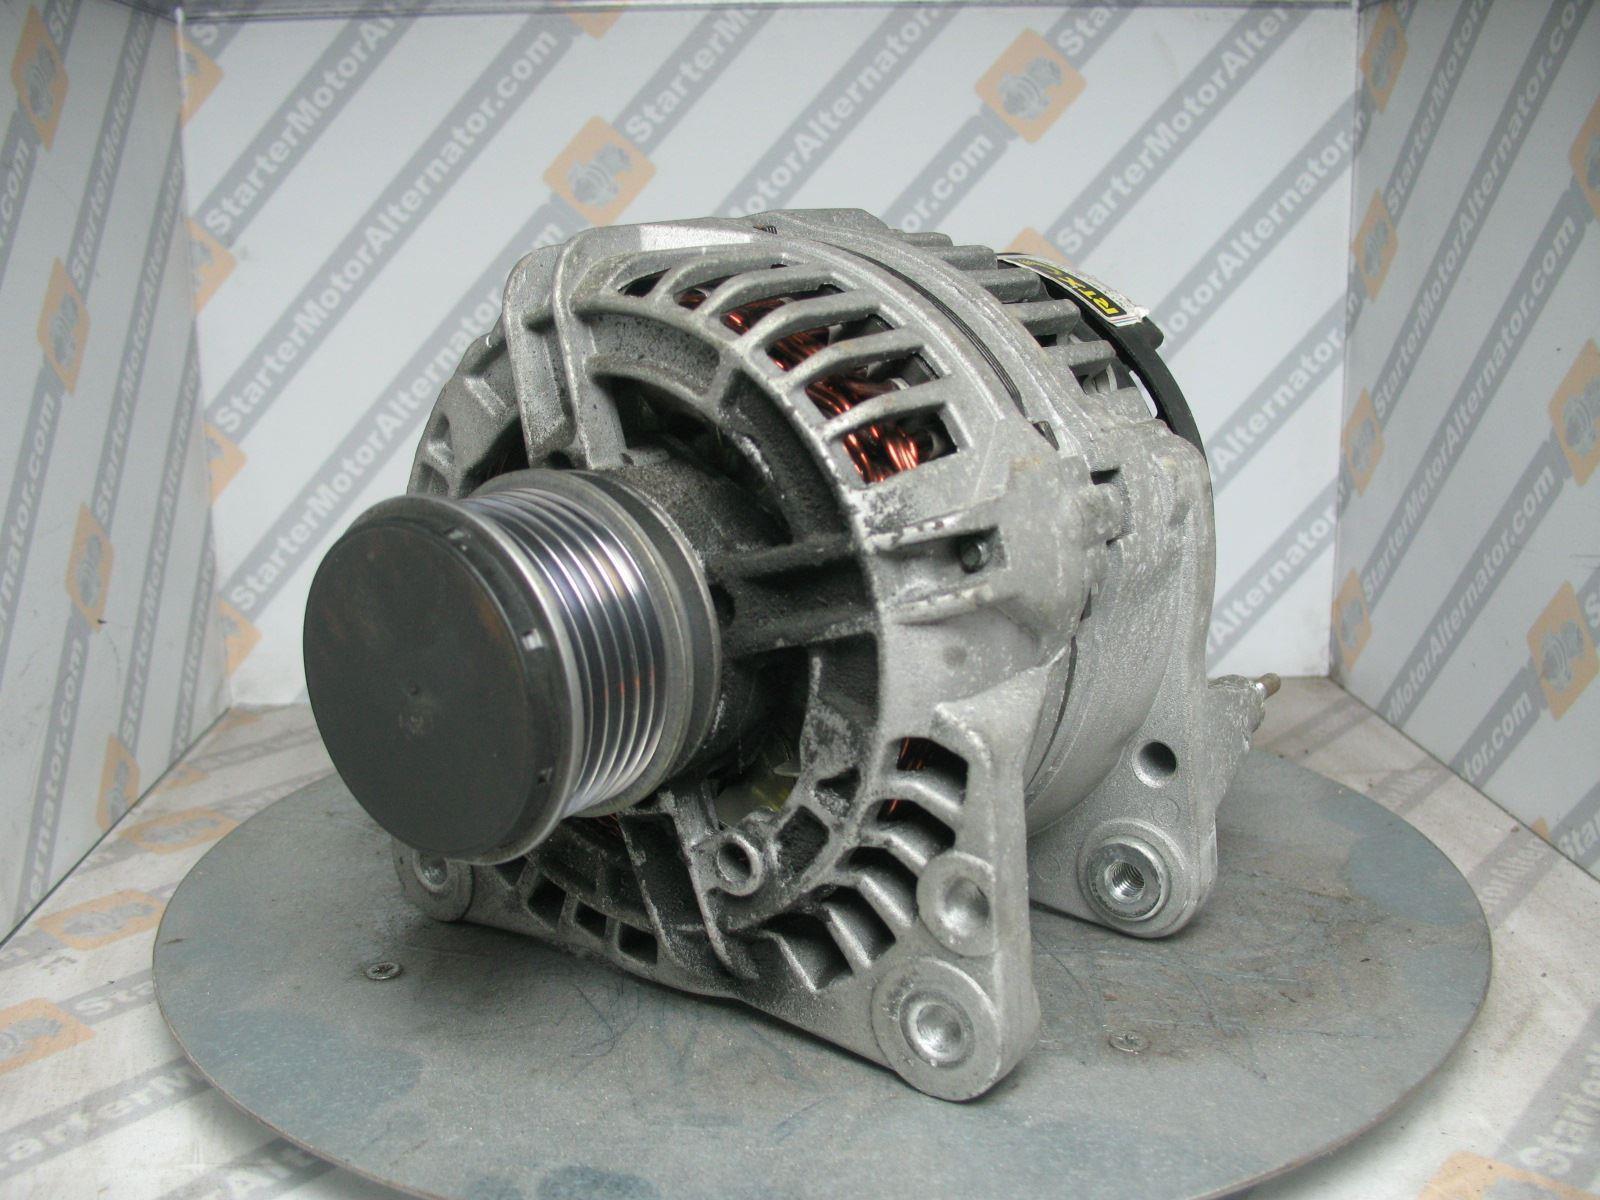 XIC1810 Alternator For Audi / Seat / Skoda / Volkswagen